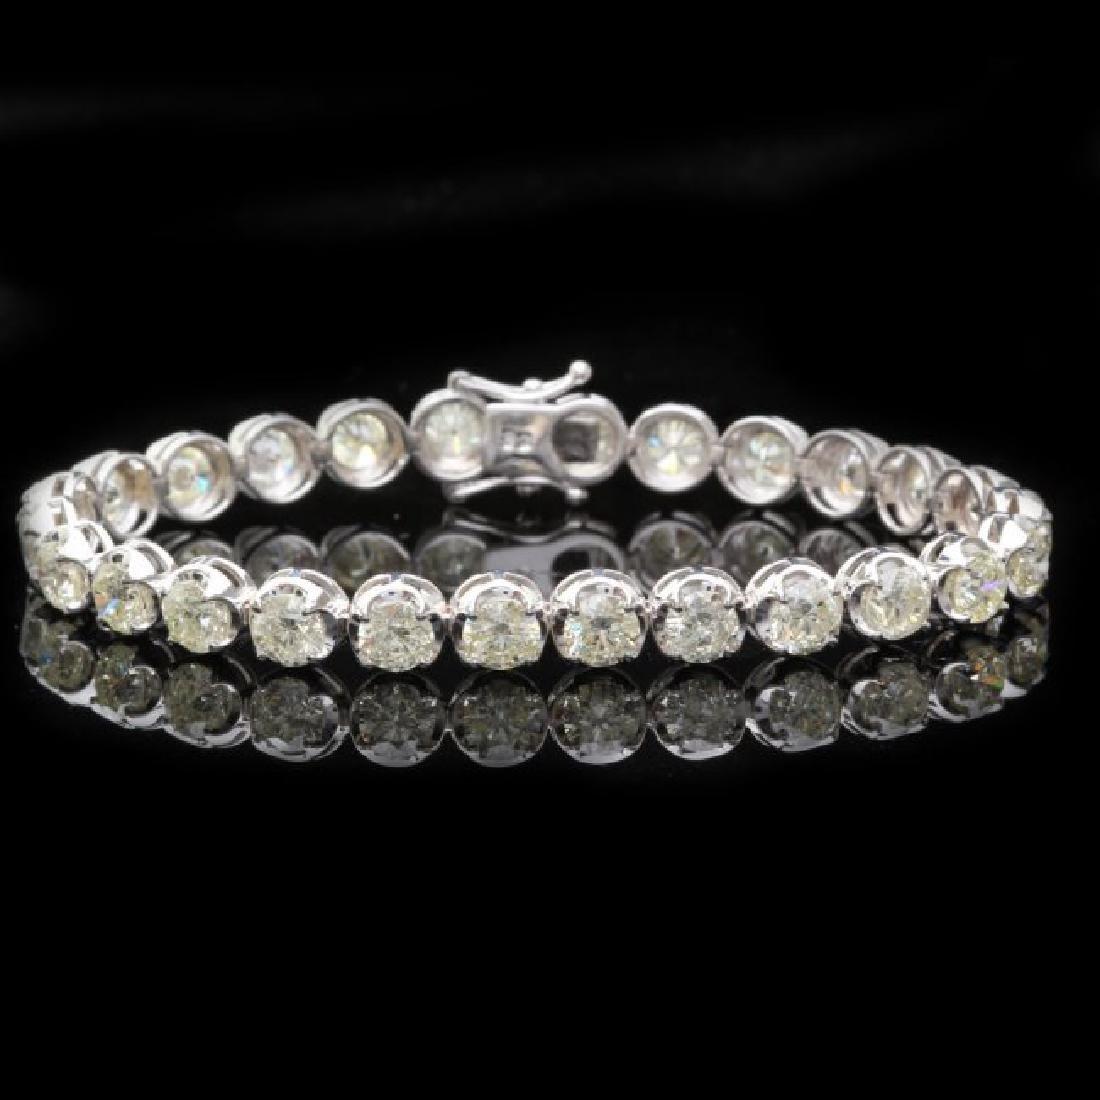 18k White Gold 14.50ct Diamond Bracelet